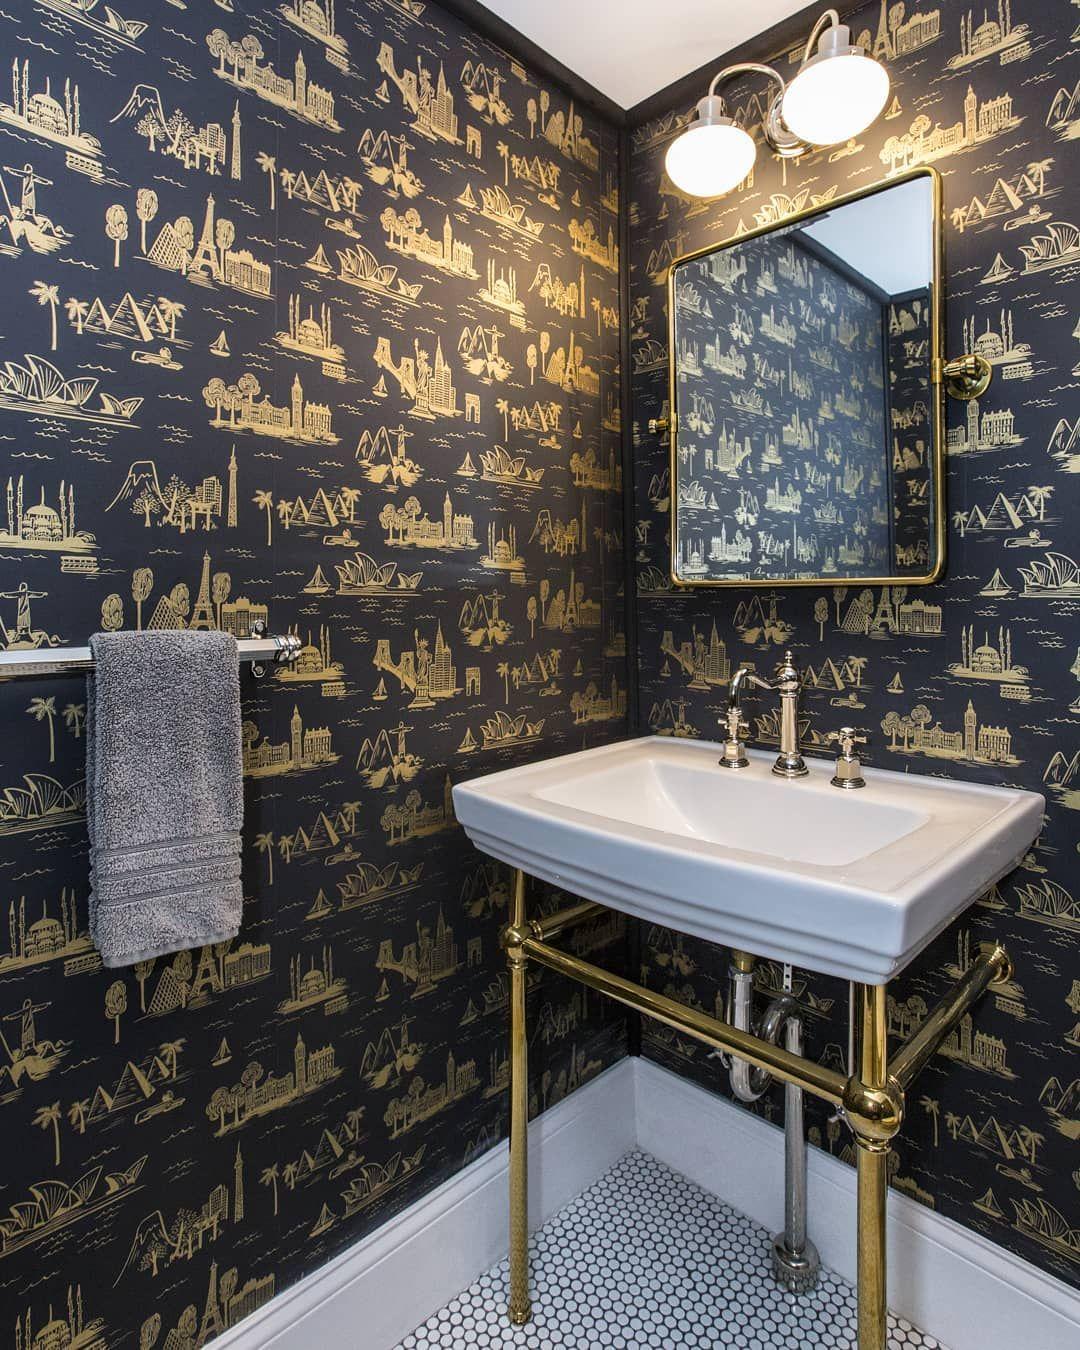 Bathroom Wallpaper Inspiration Paulinahospod Bathroomdesign Bathroomdecor Bathroomwallp Small Bathroom Paint Hospital Interior Design Purple Bathroom Decor